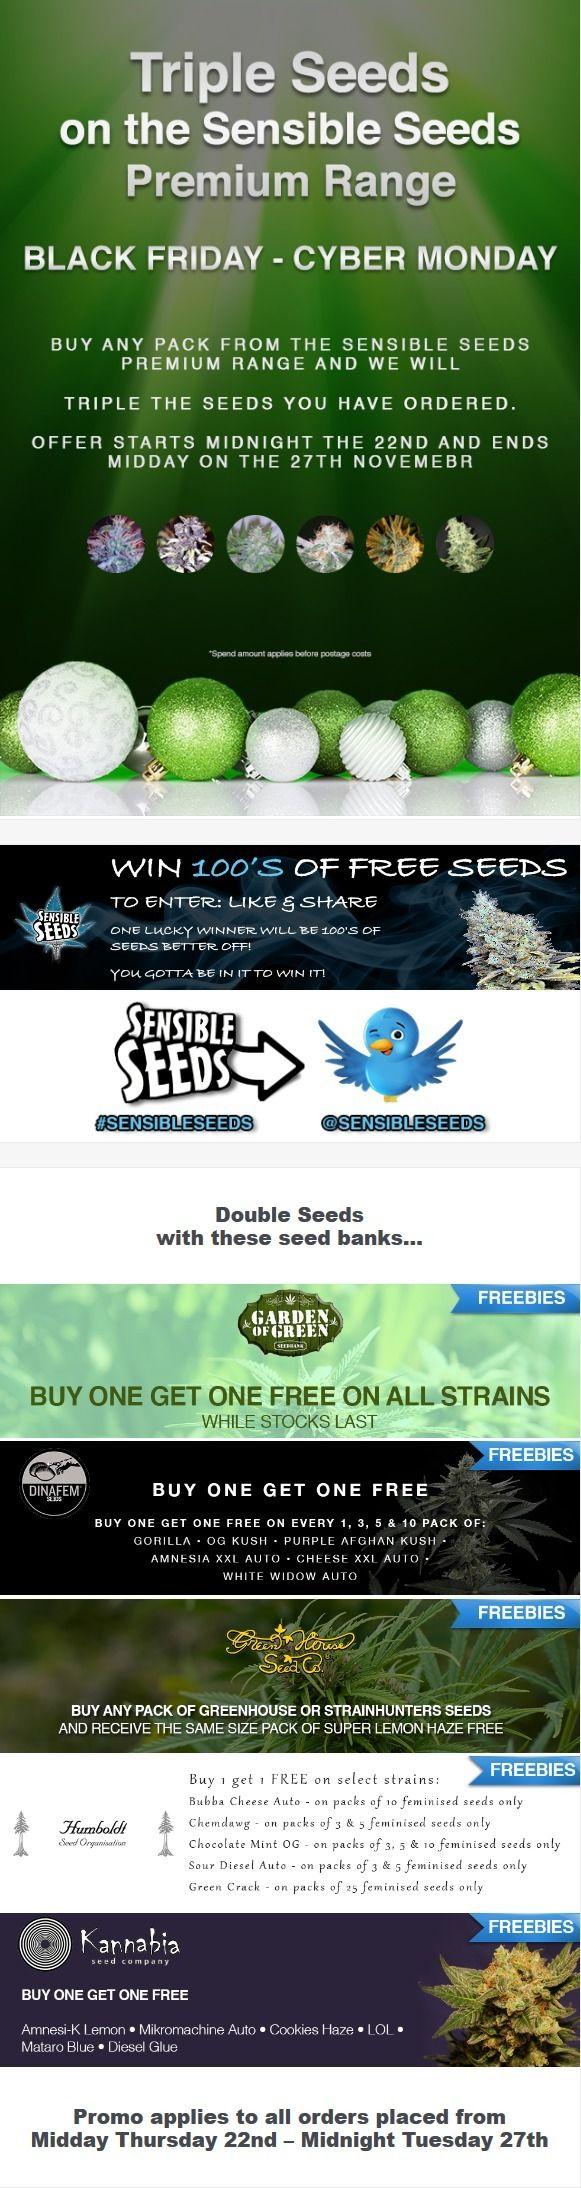 Black Friday Promo Seeds offeri - sensibleseeds   ello